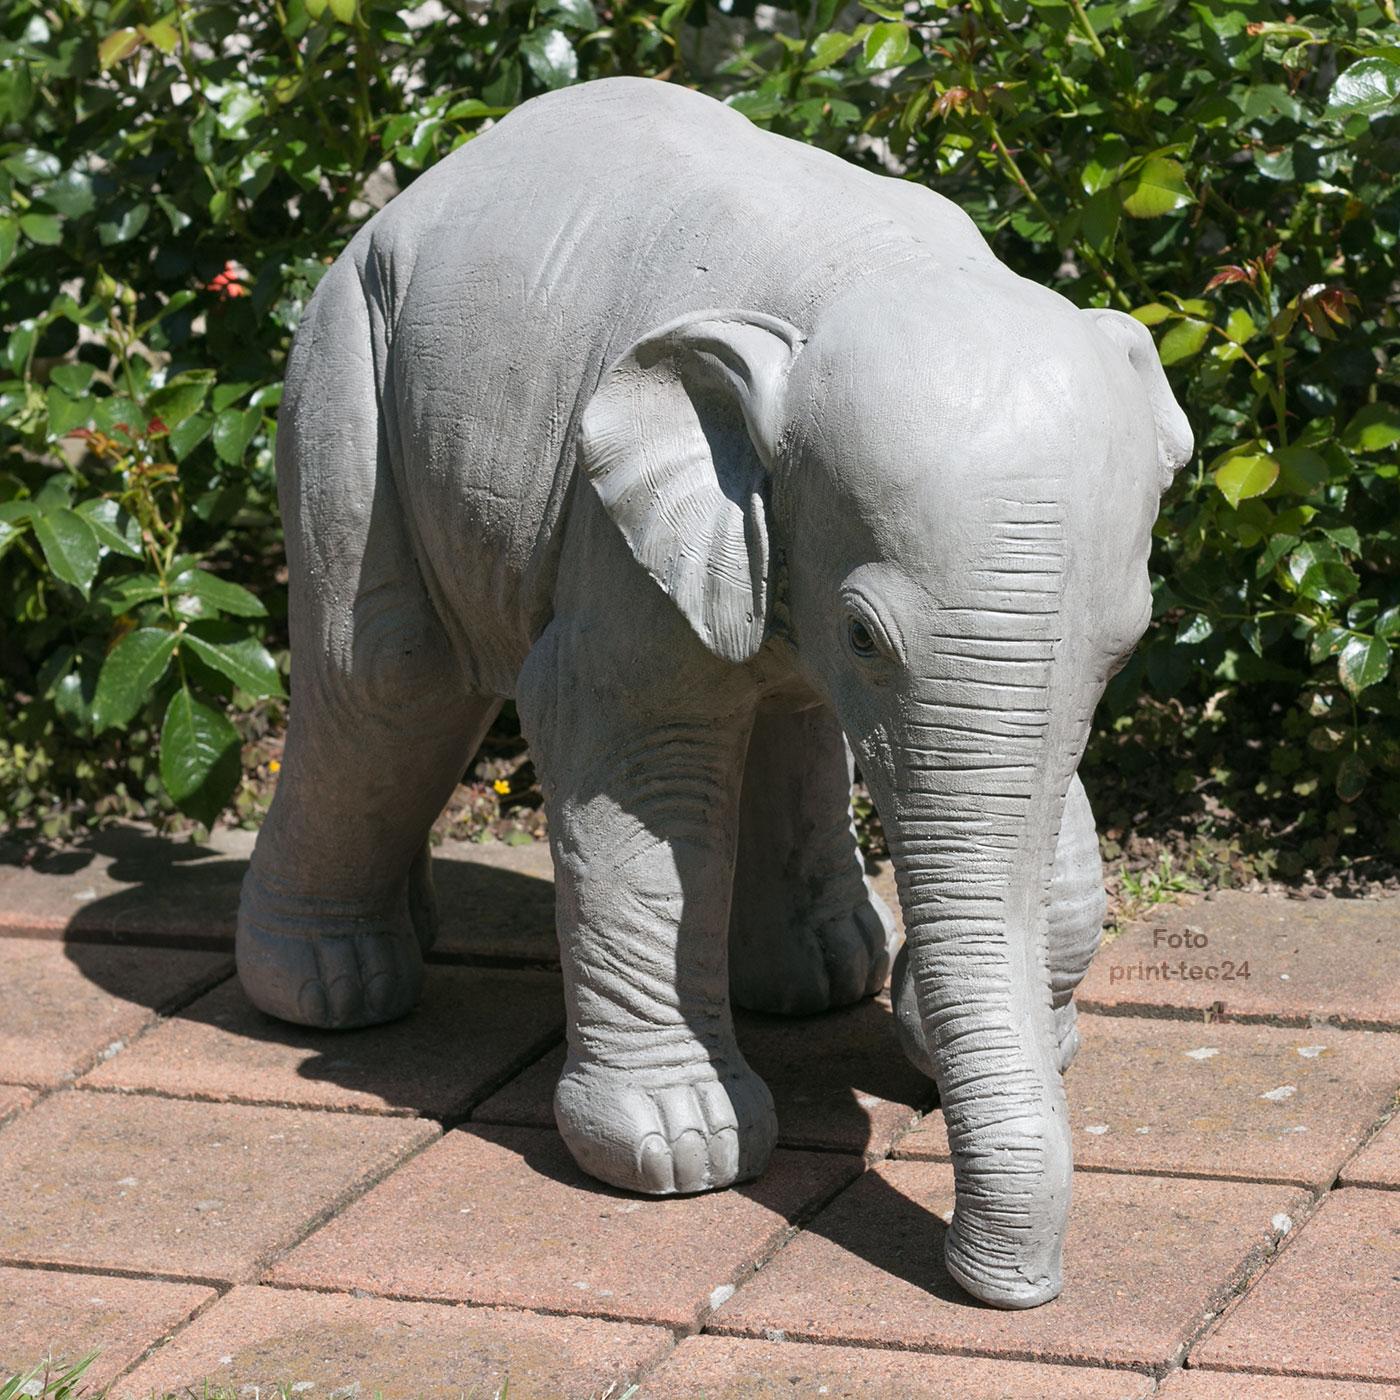 Inspirierend Gartenfiguren Aus Kunststoff Ideen